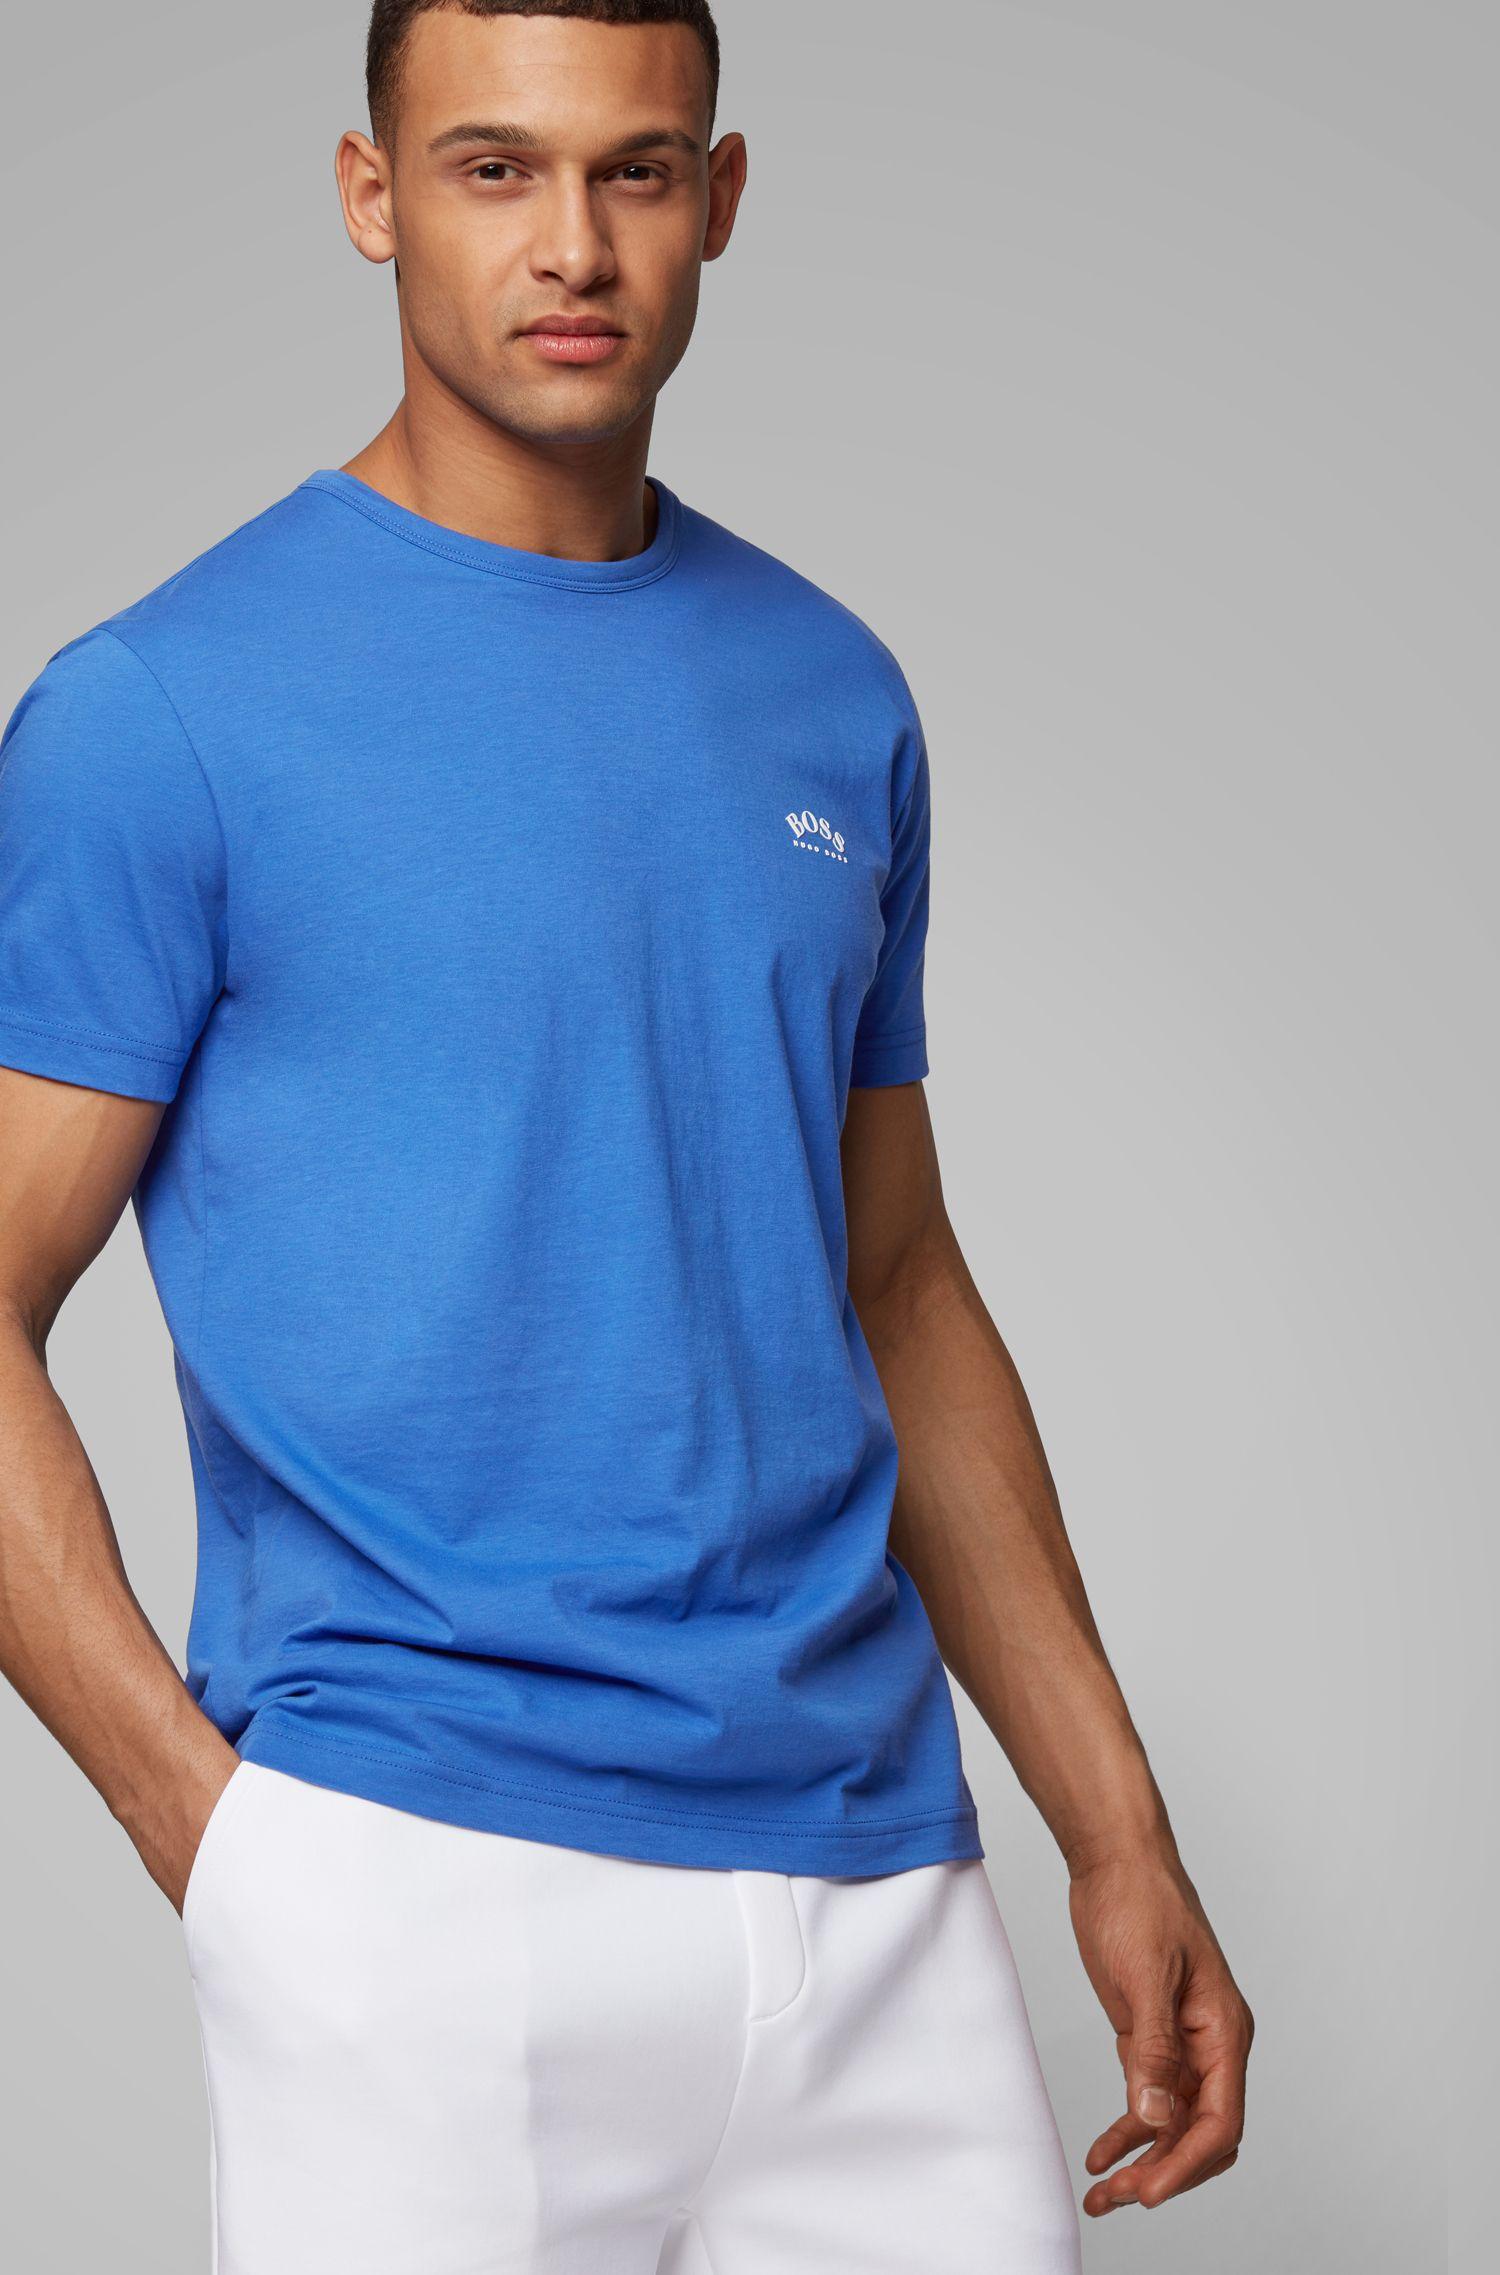 Camiseta de punto de algodón con logo curvado, Azul